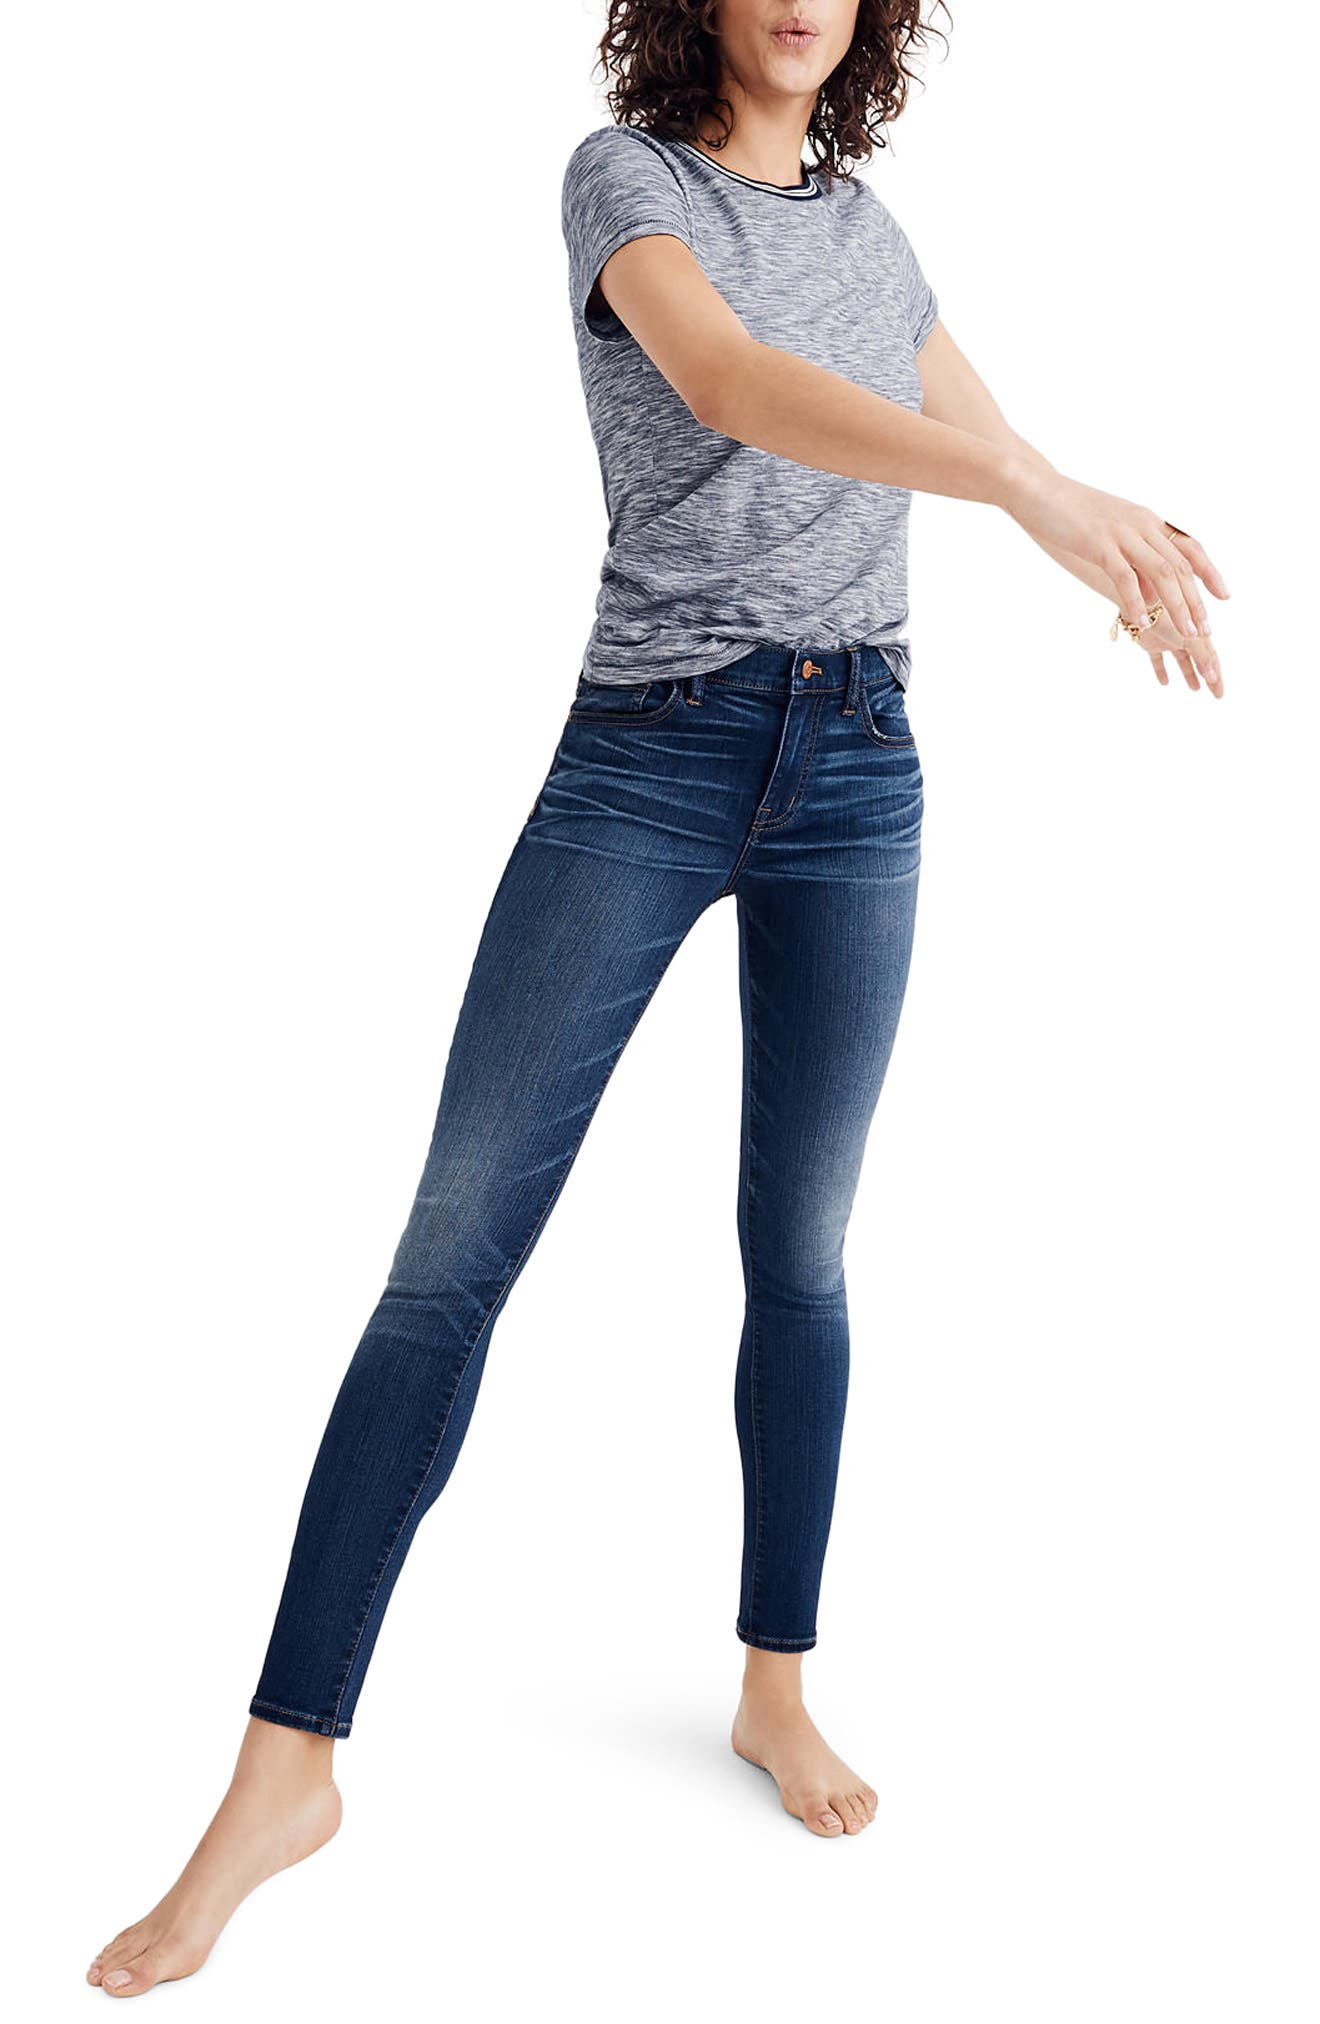 Roadtripper Jeans,                         Main,                         color, 416